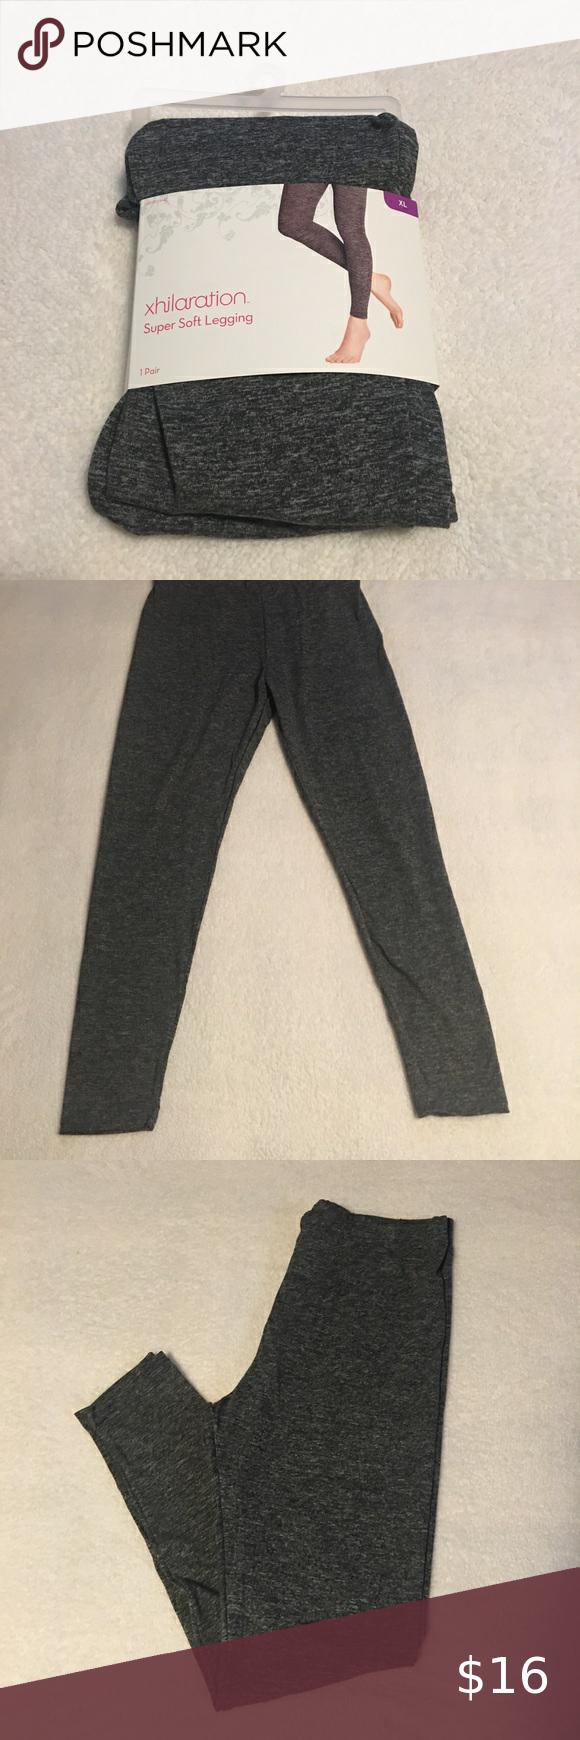 4-6 Black Super Soft Legging Xhilaration Size Small